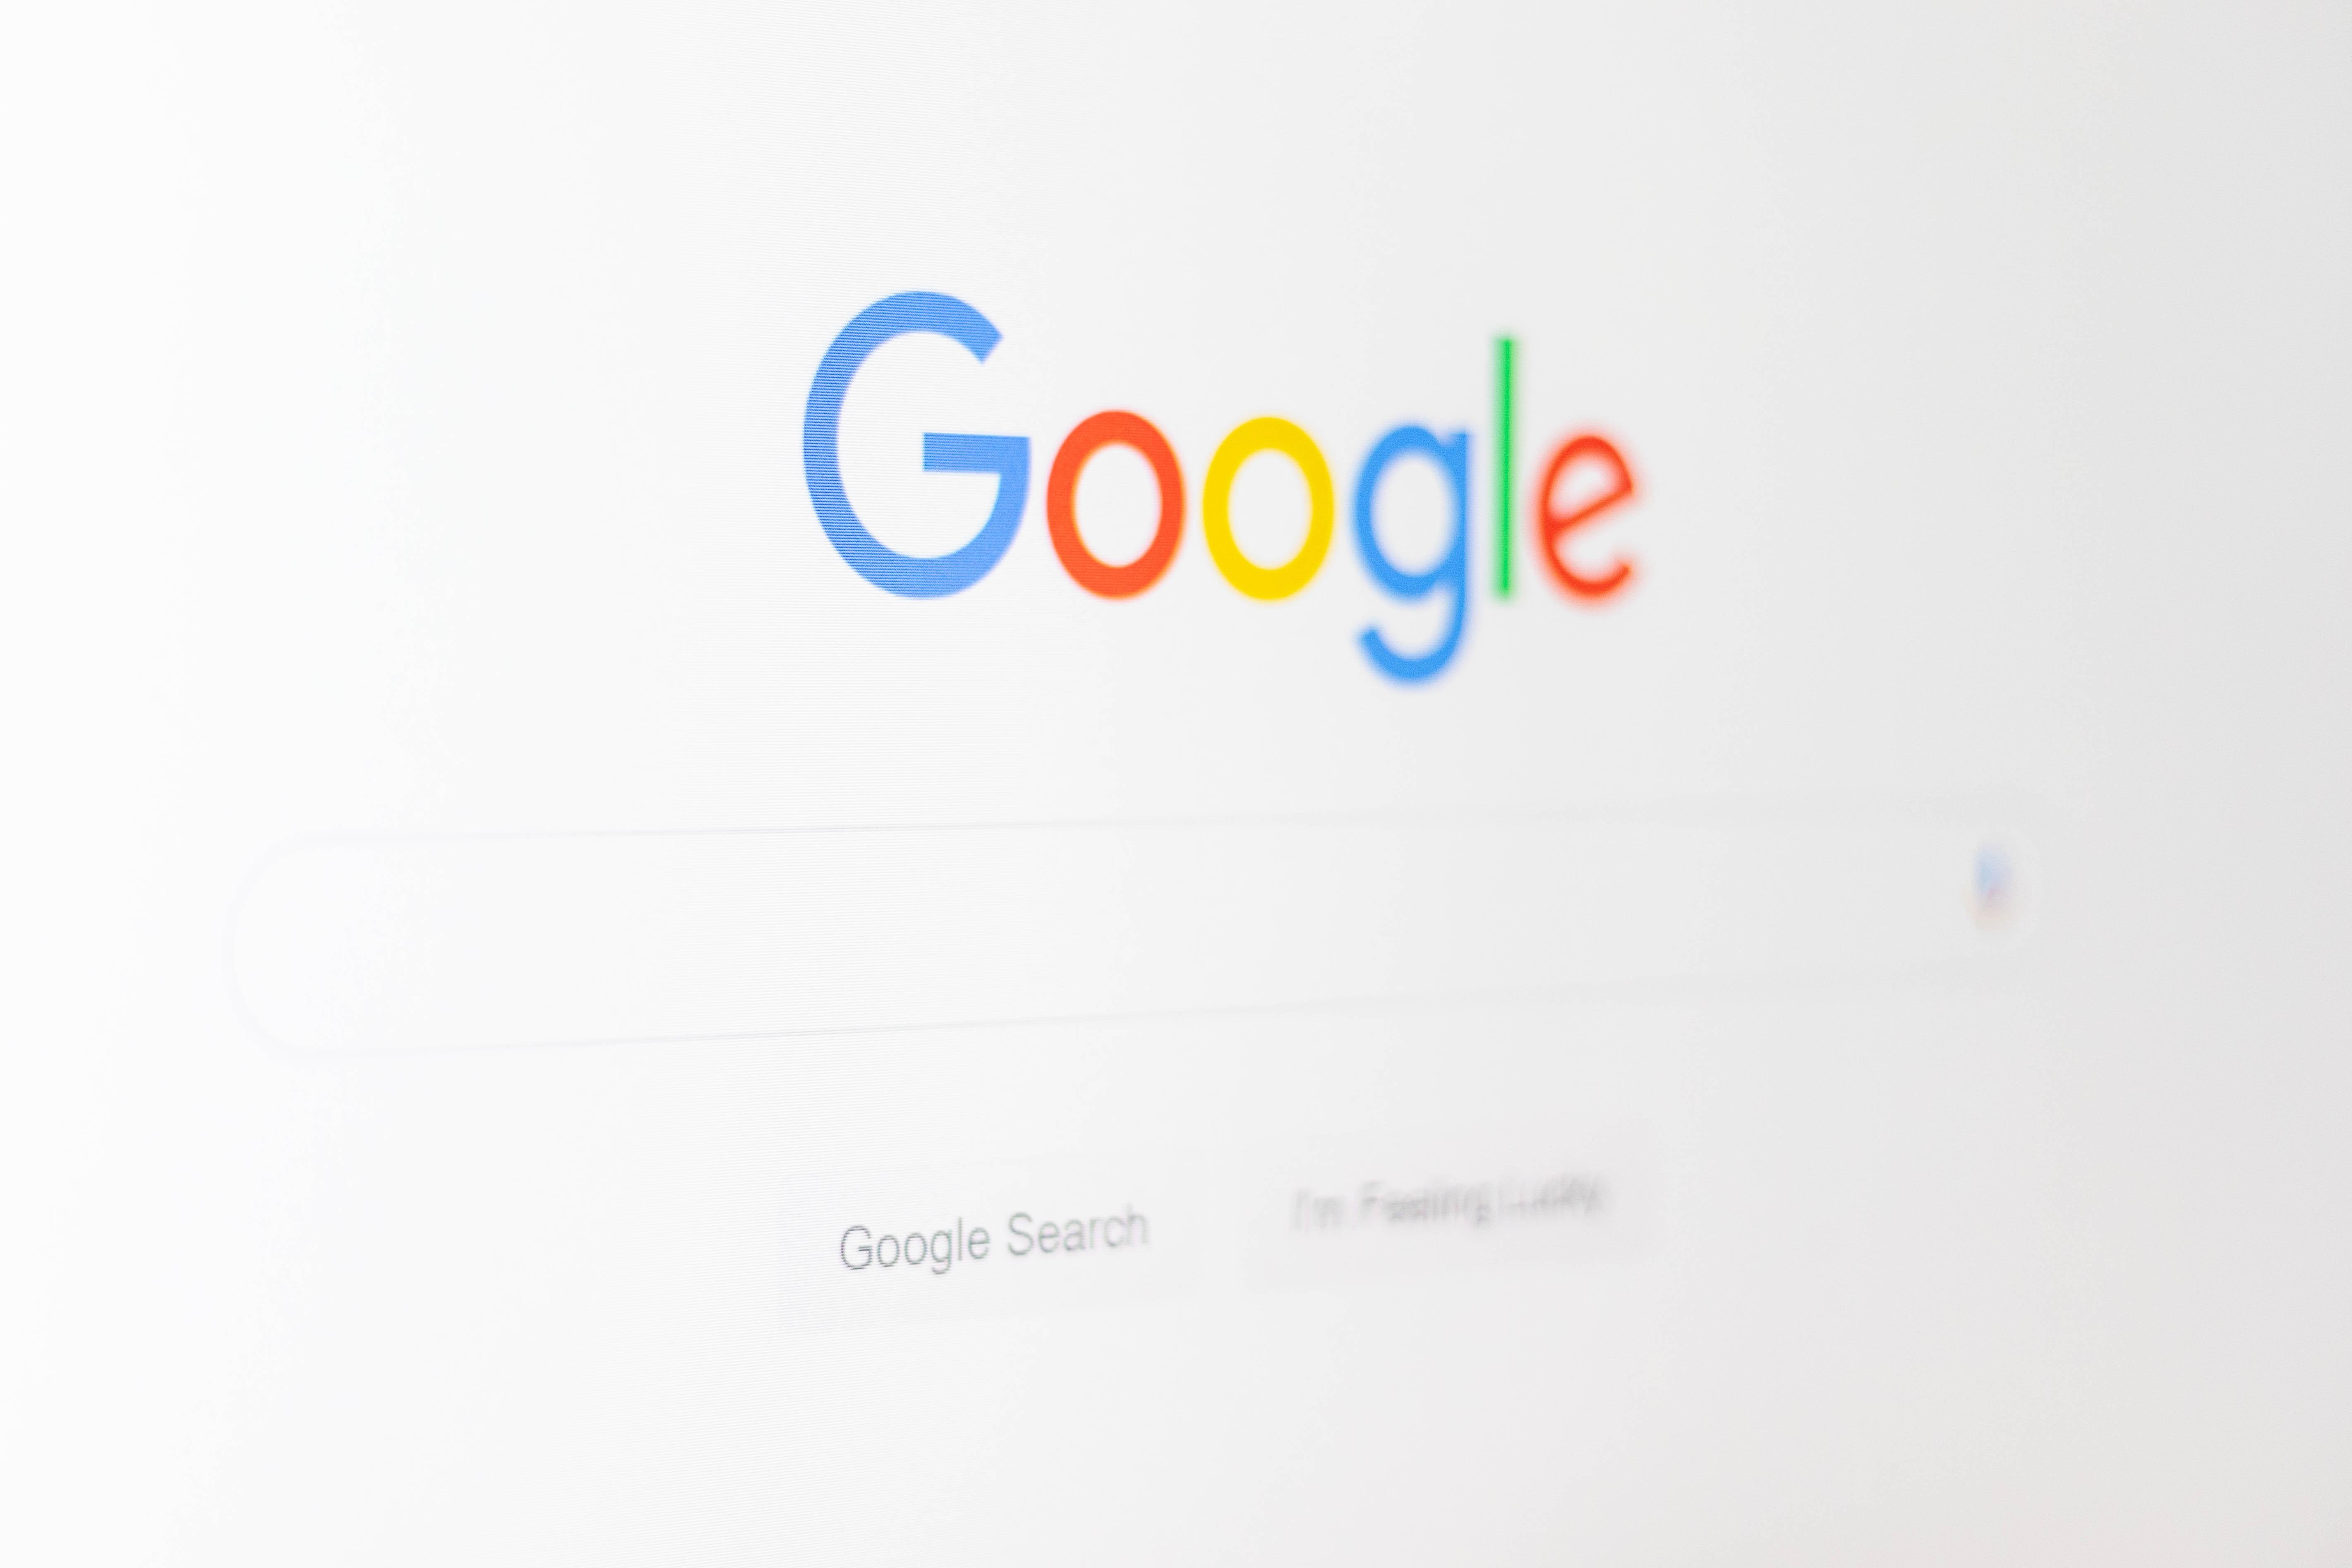 Gooogle search image